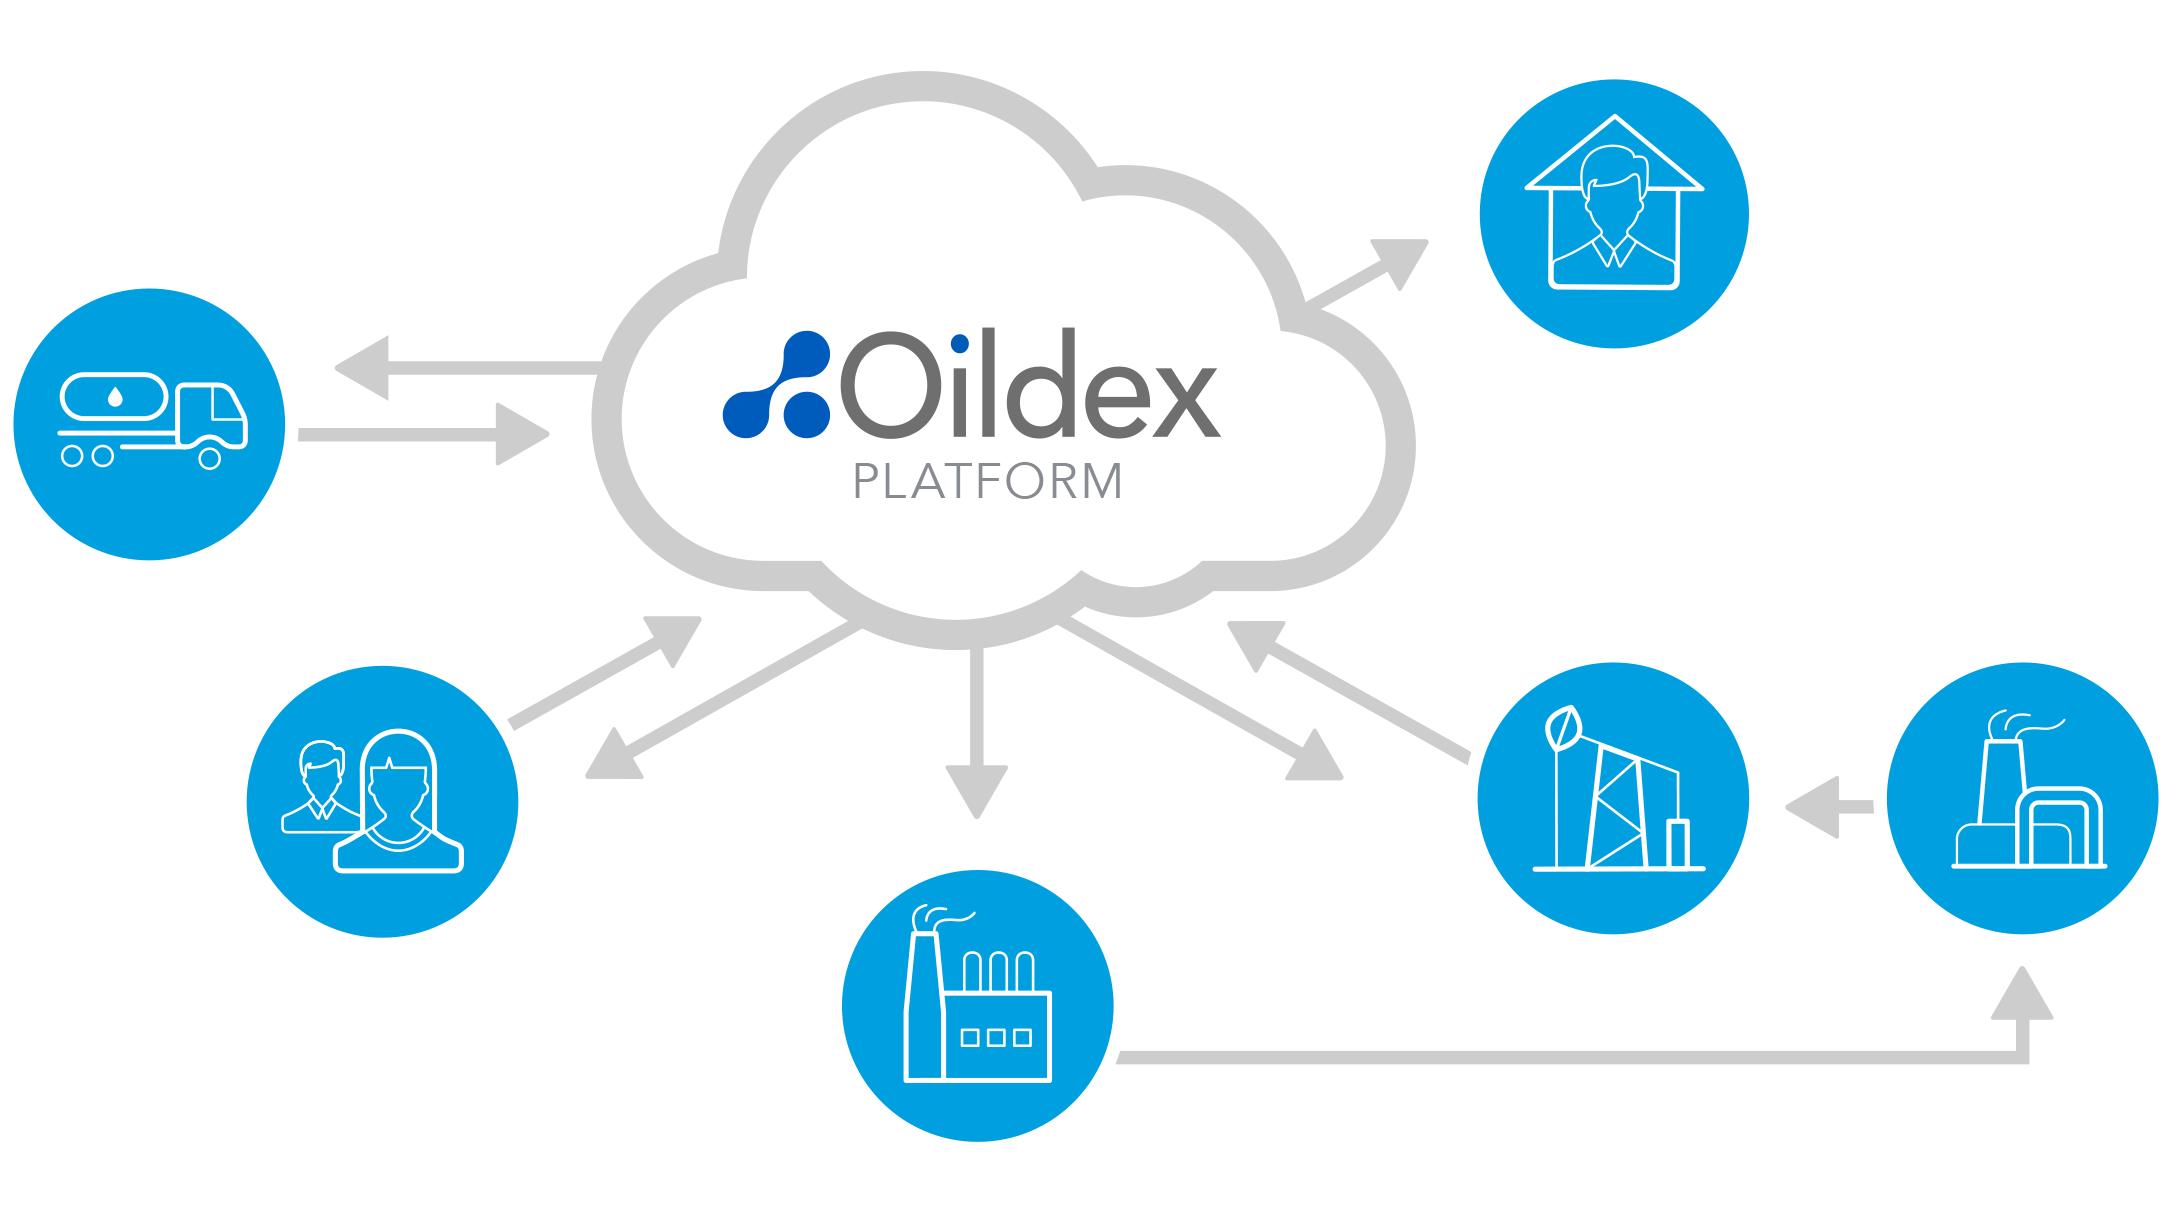 Supply Chain Finance Platform - Openinvoice an oildex solution